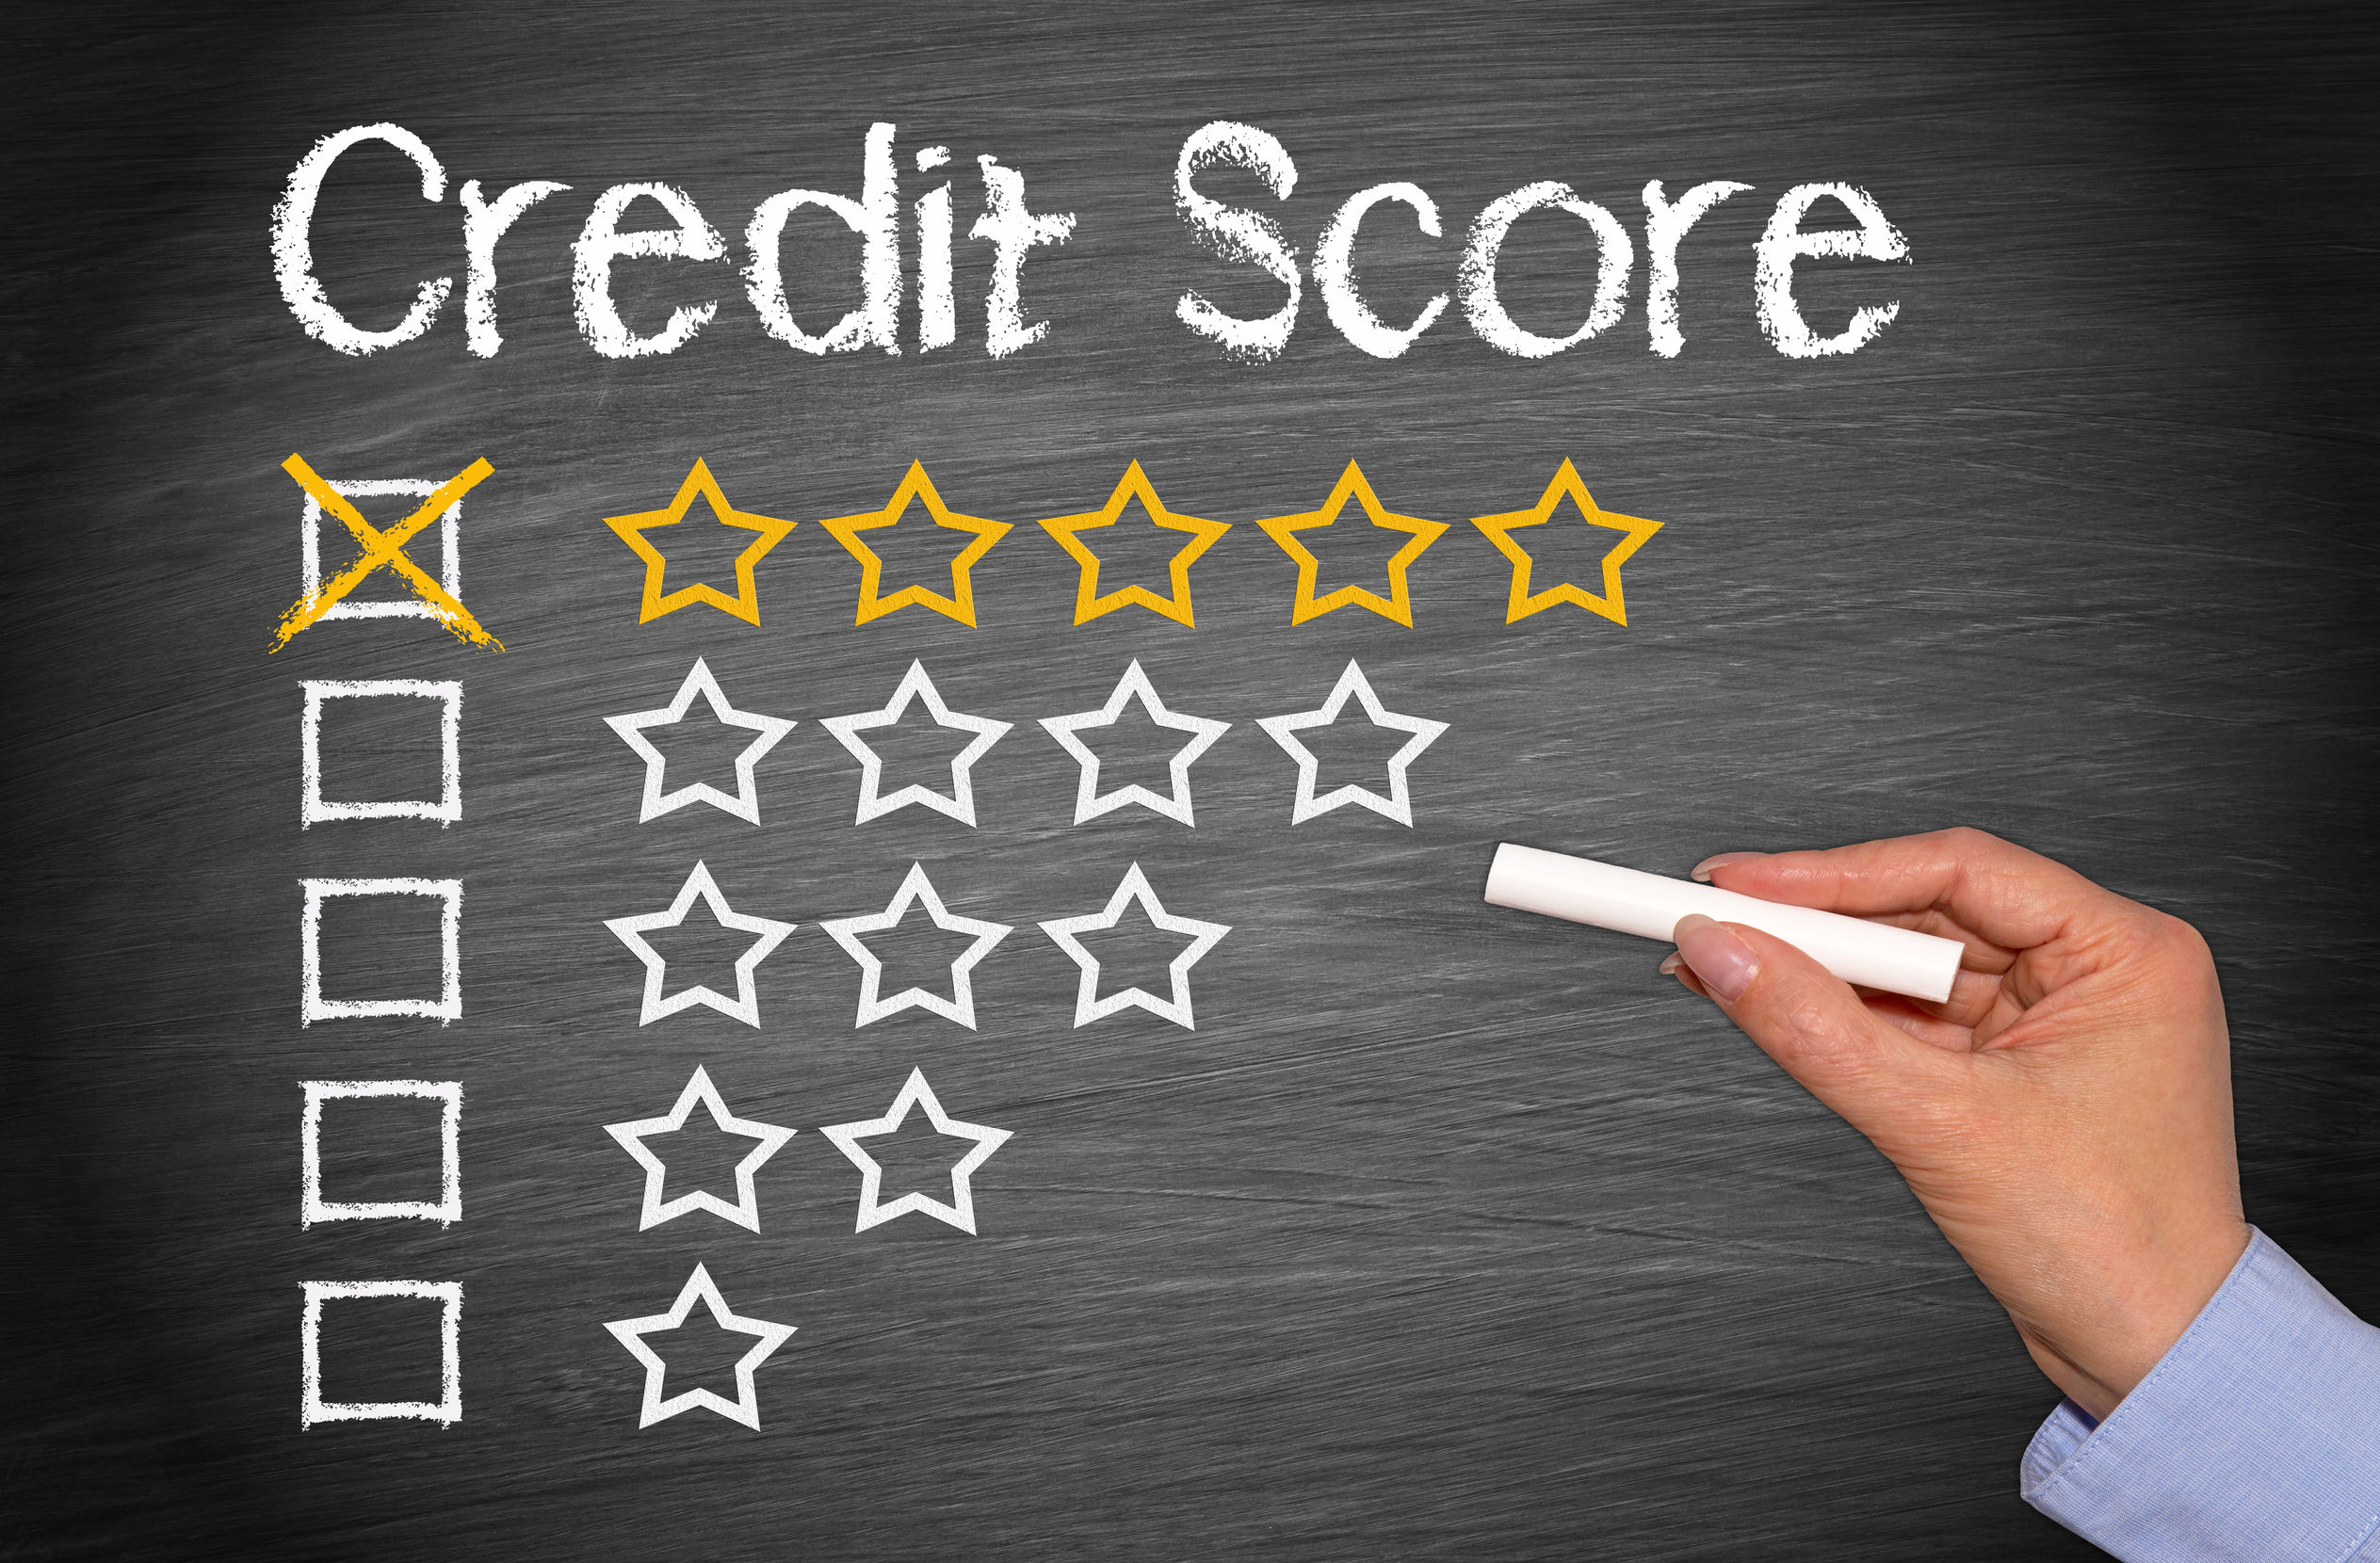 30794491 - credit score